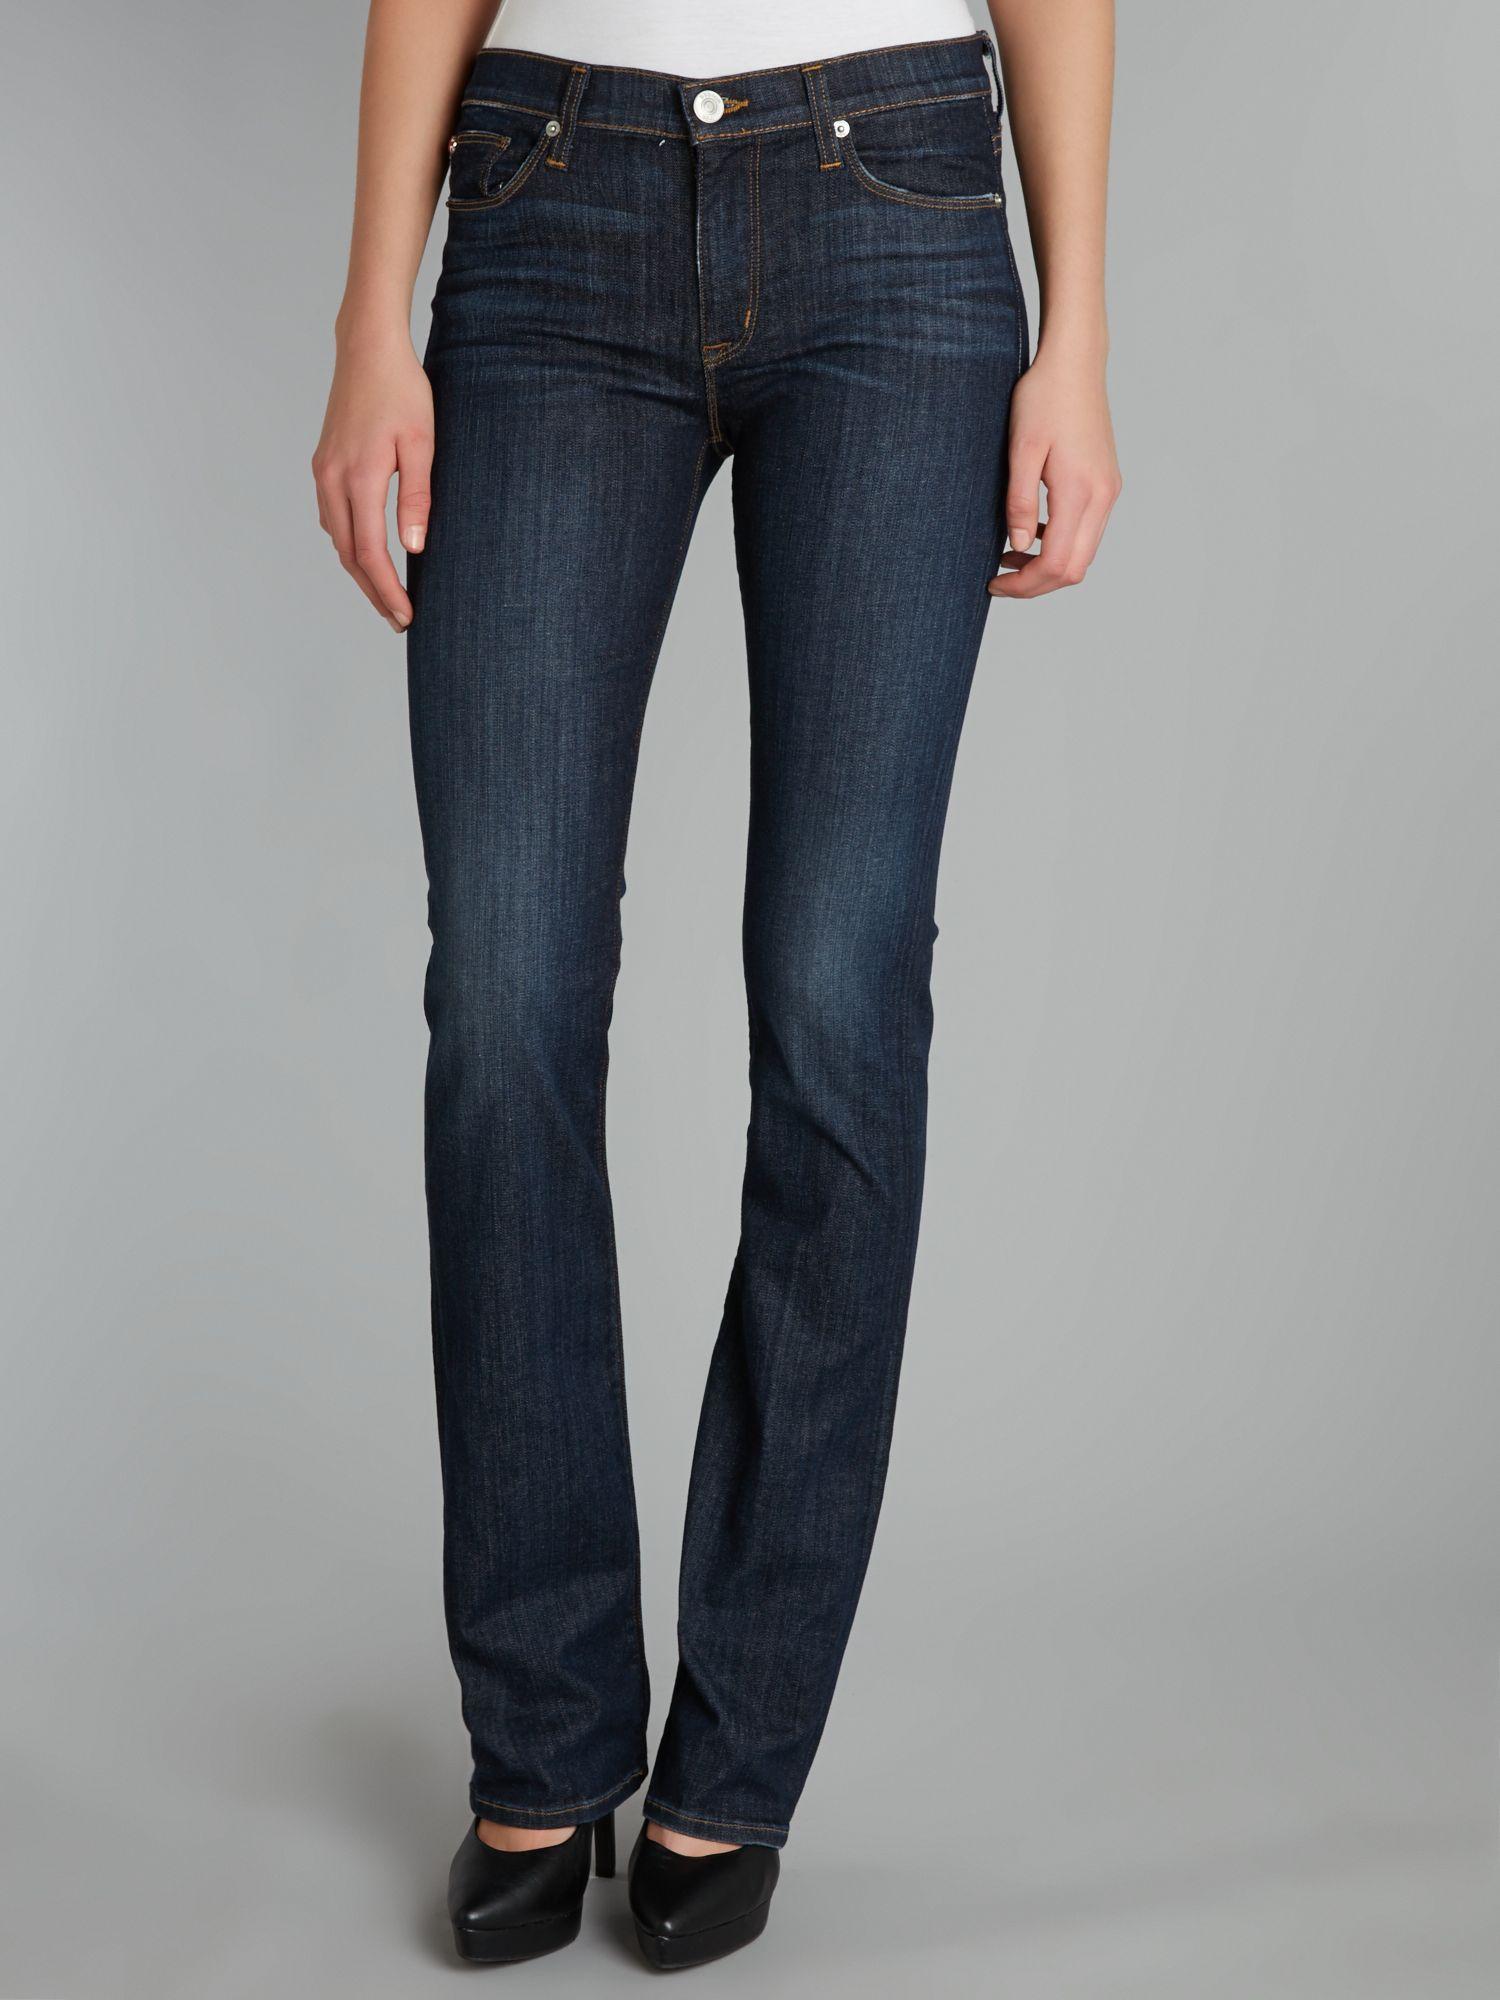 Hudson Jeans Elle Baby Bootcut Jeans in Abbey in Denim Dark Wash (Blue)